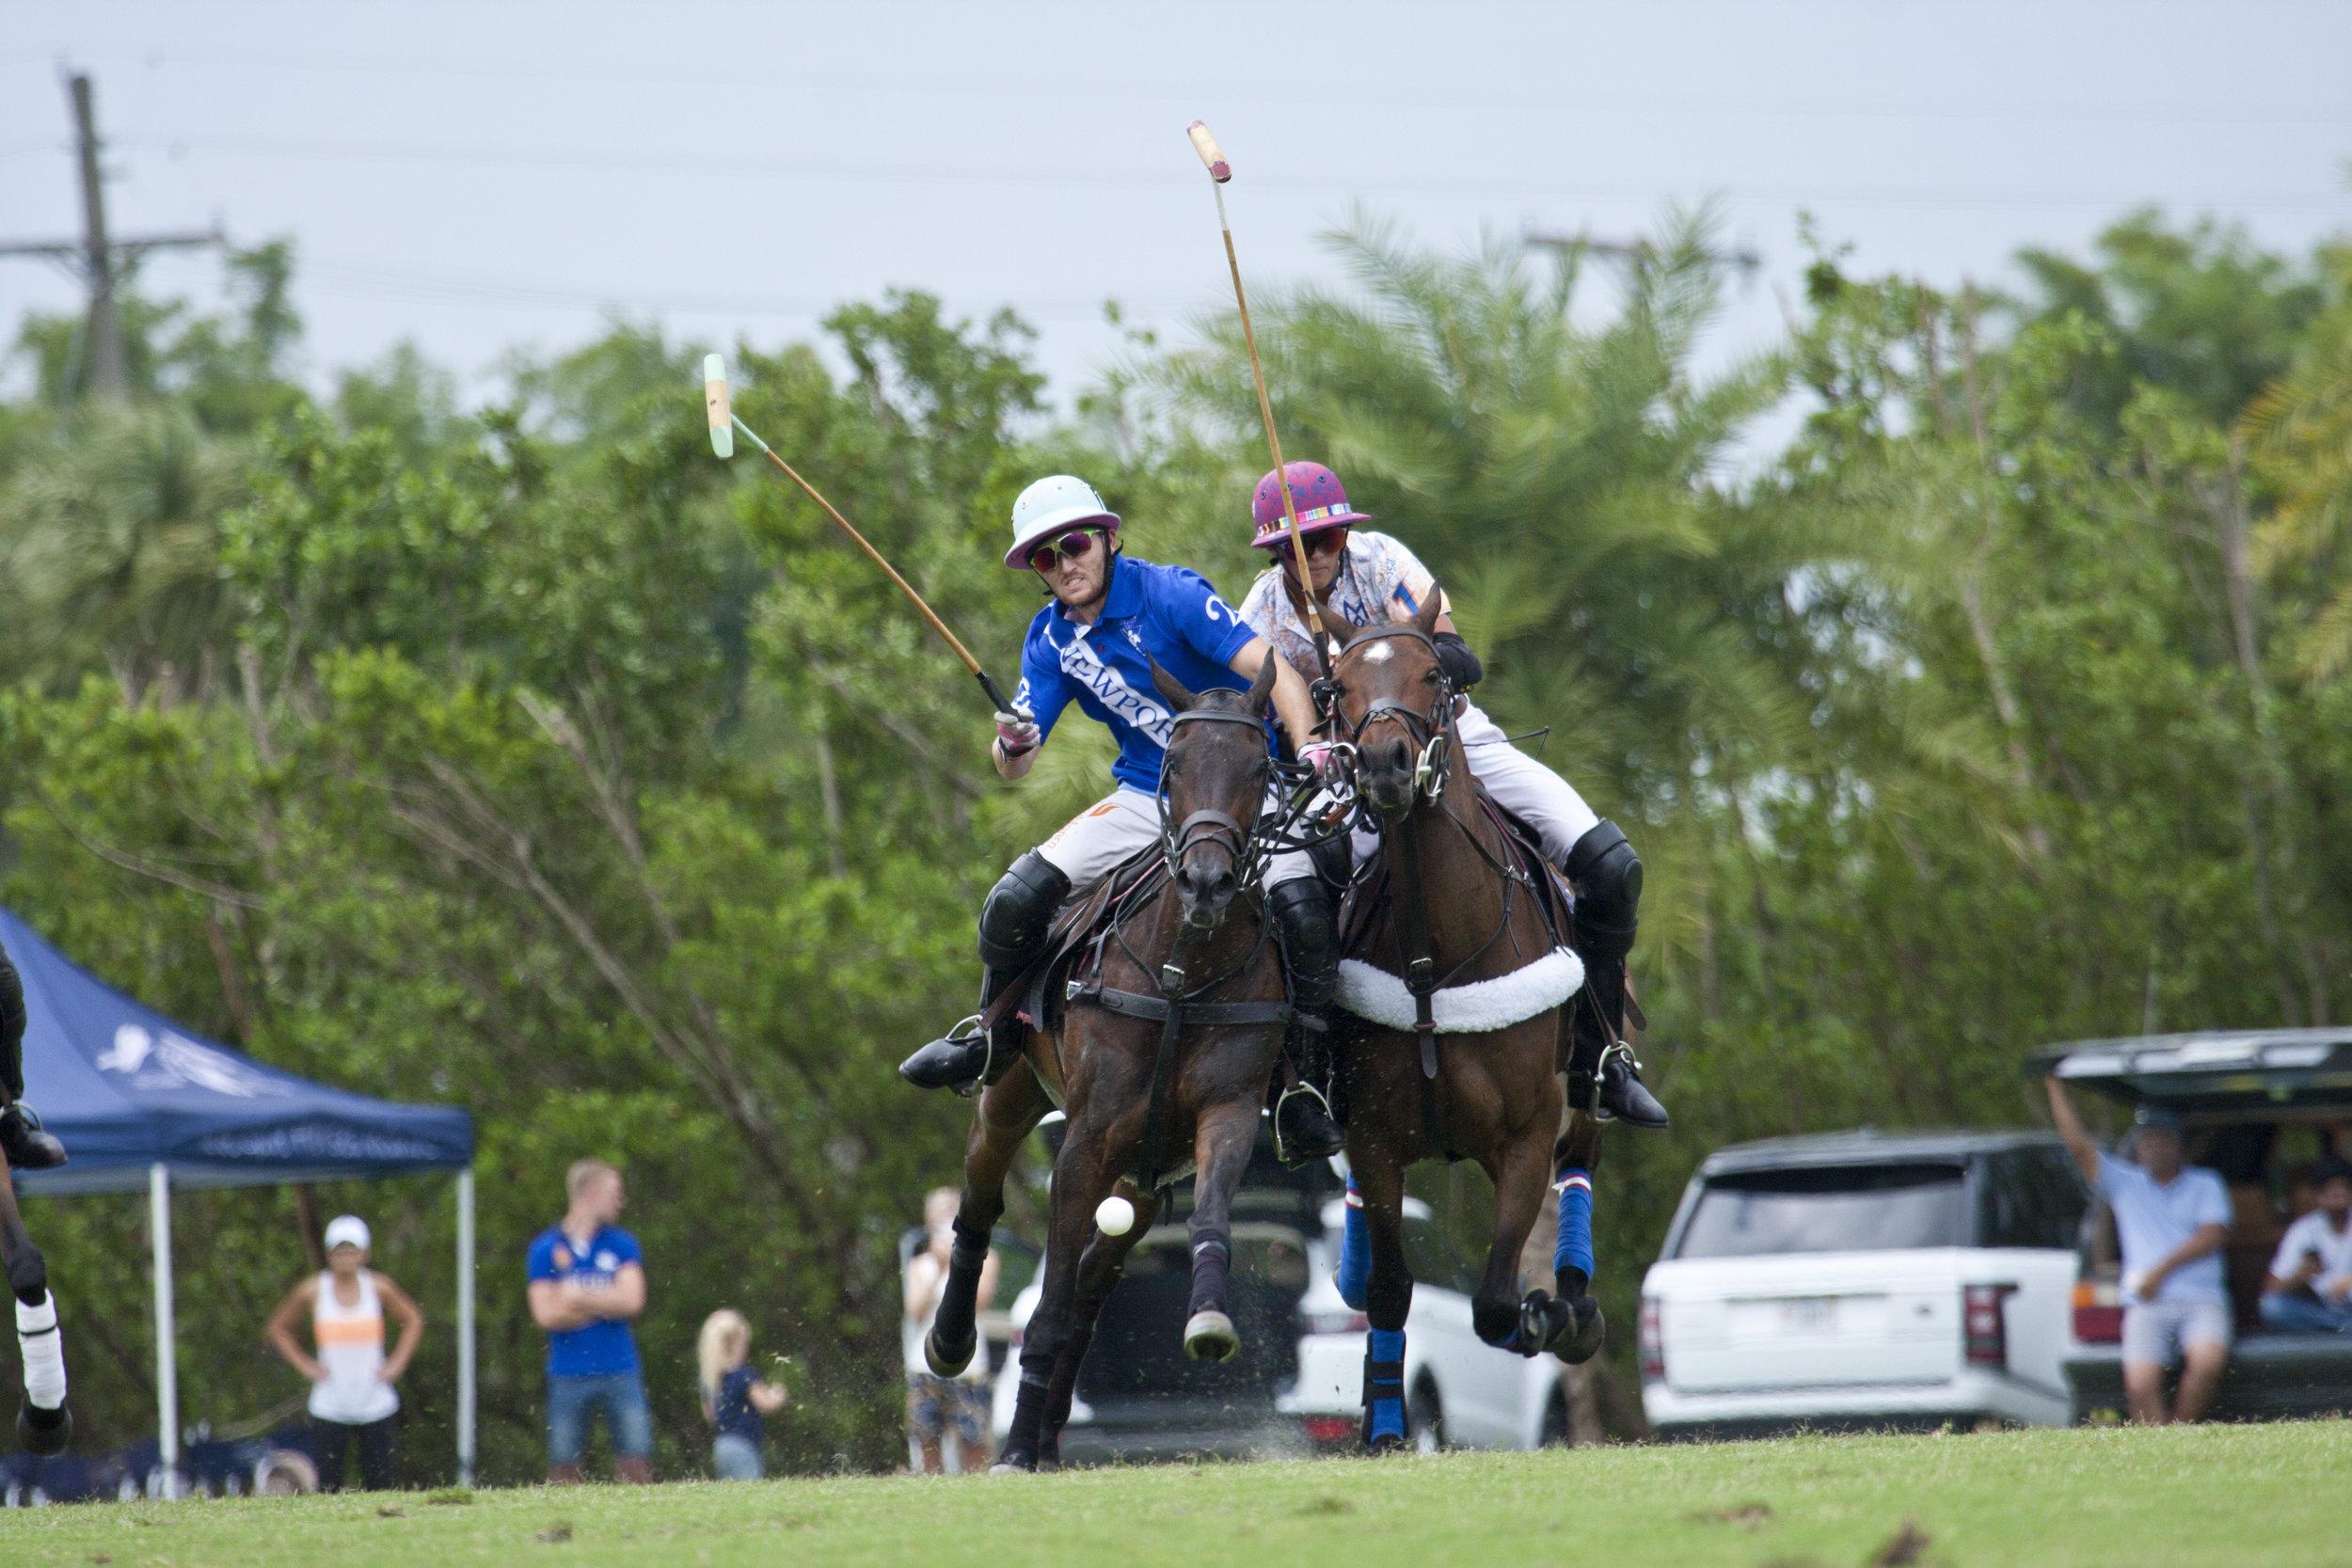 Timmy Dutta of Dutta Corp tries to ride.JPG